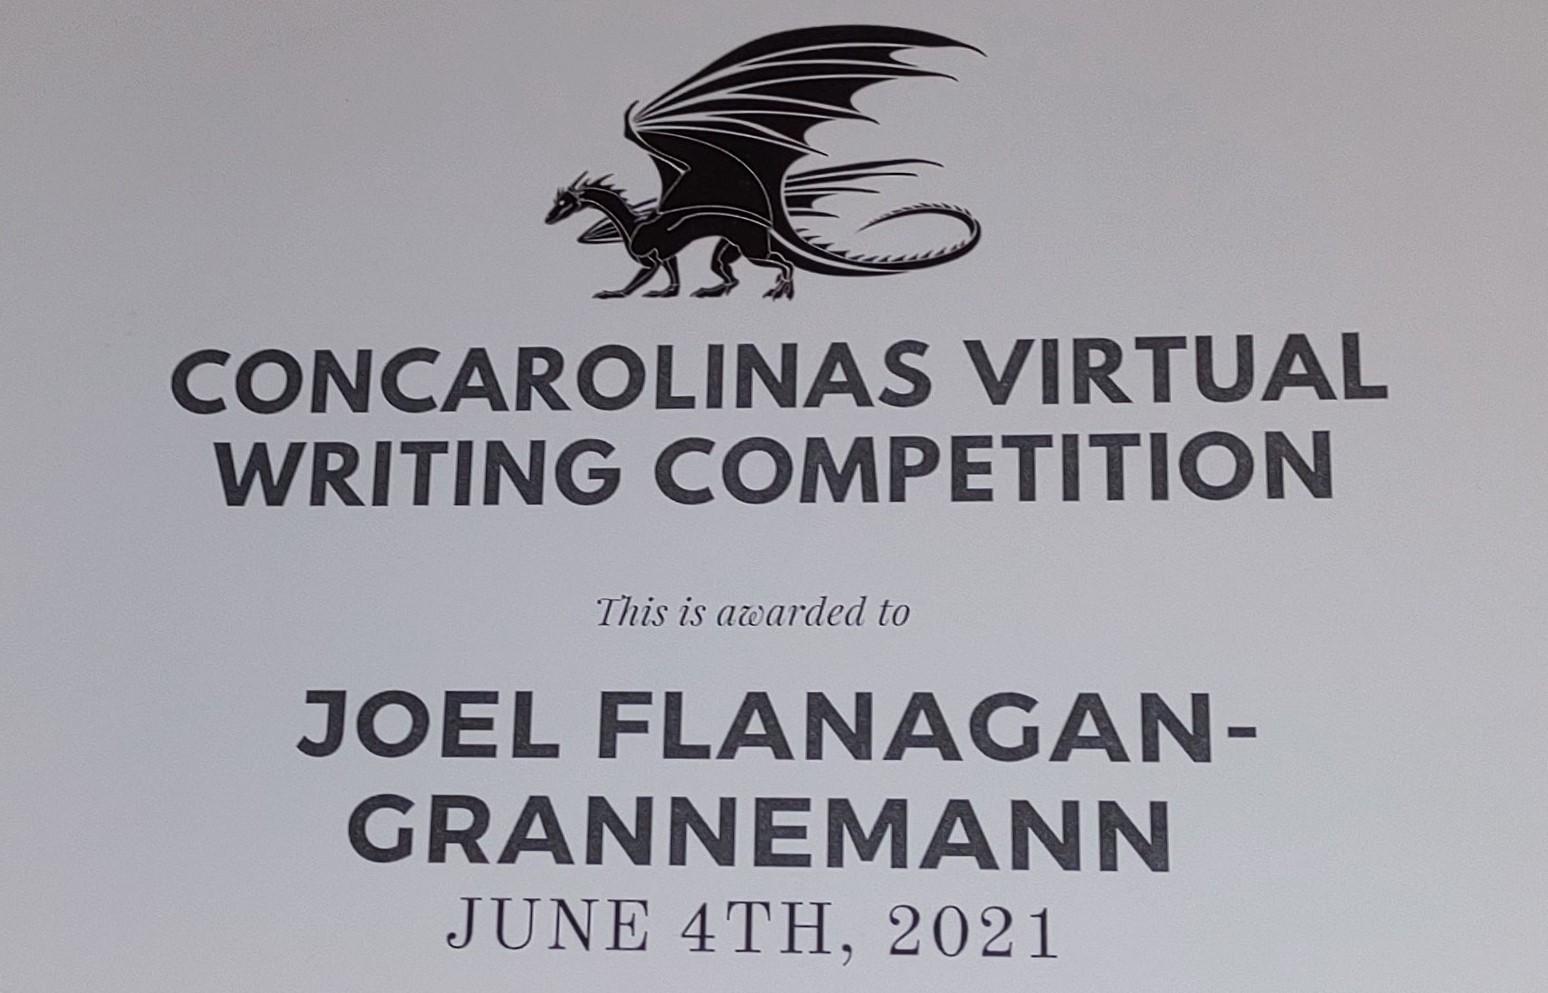 2021-06-04 ConCarolinas 2021 Certificate